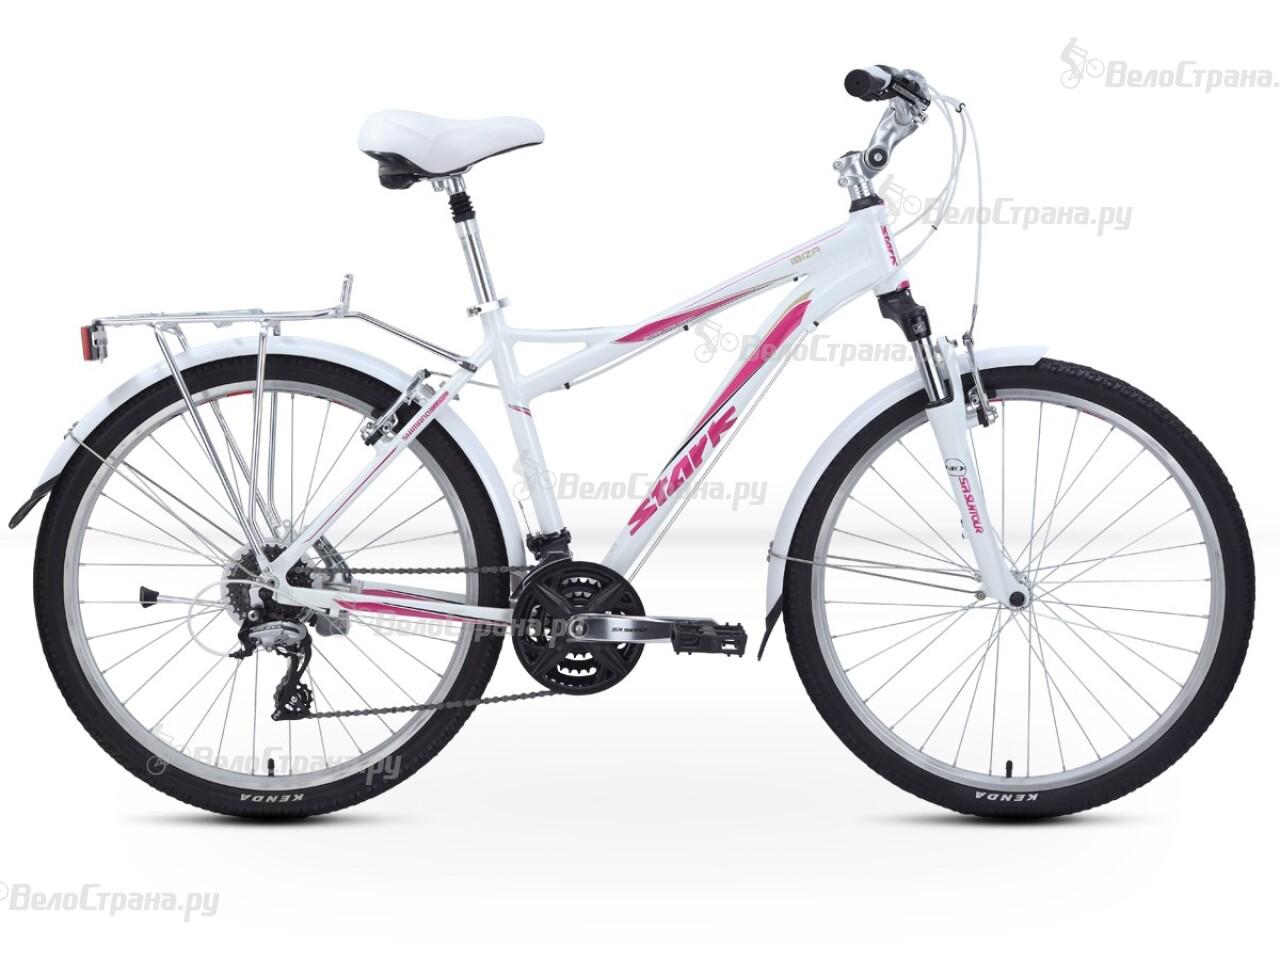 Велосипед Stark Ibiza (2013) 聪明豆绘本系列:小猪变形记